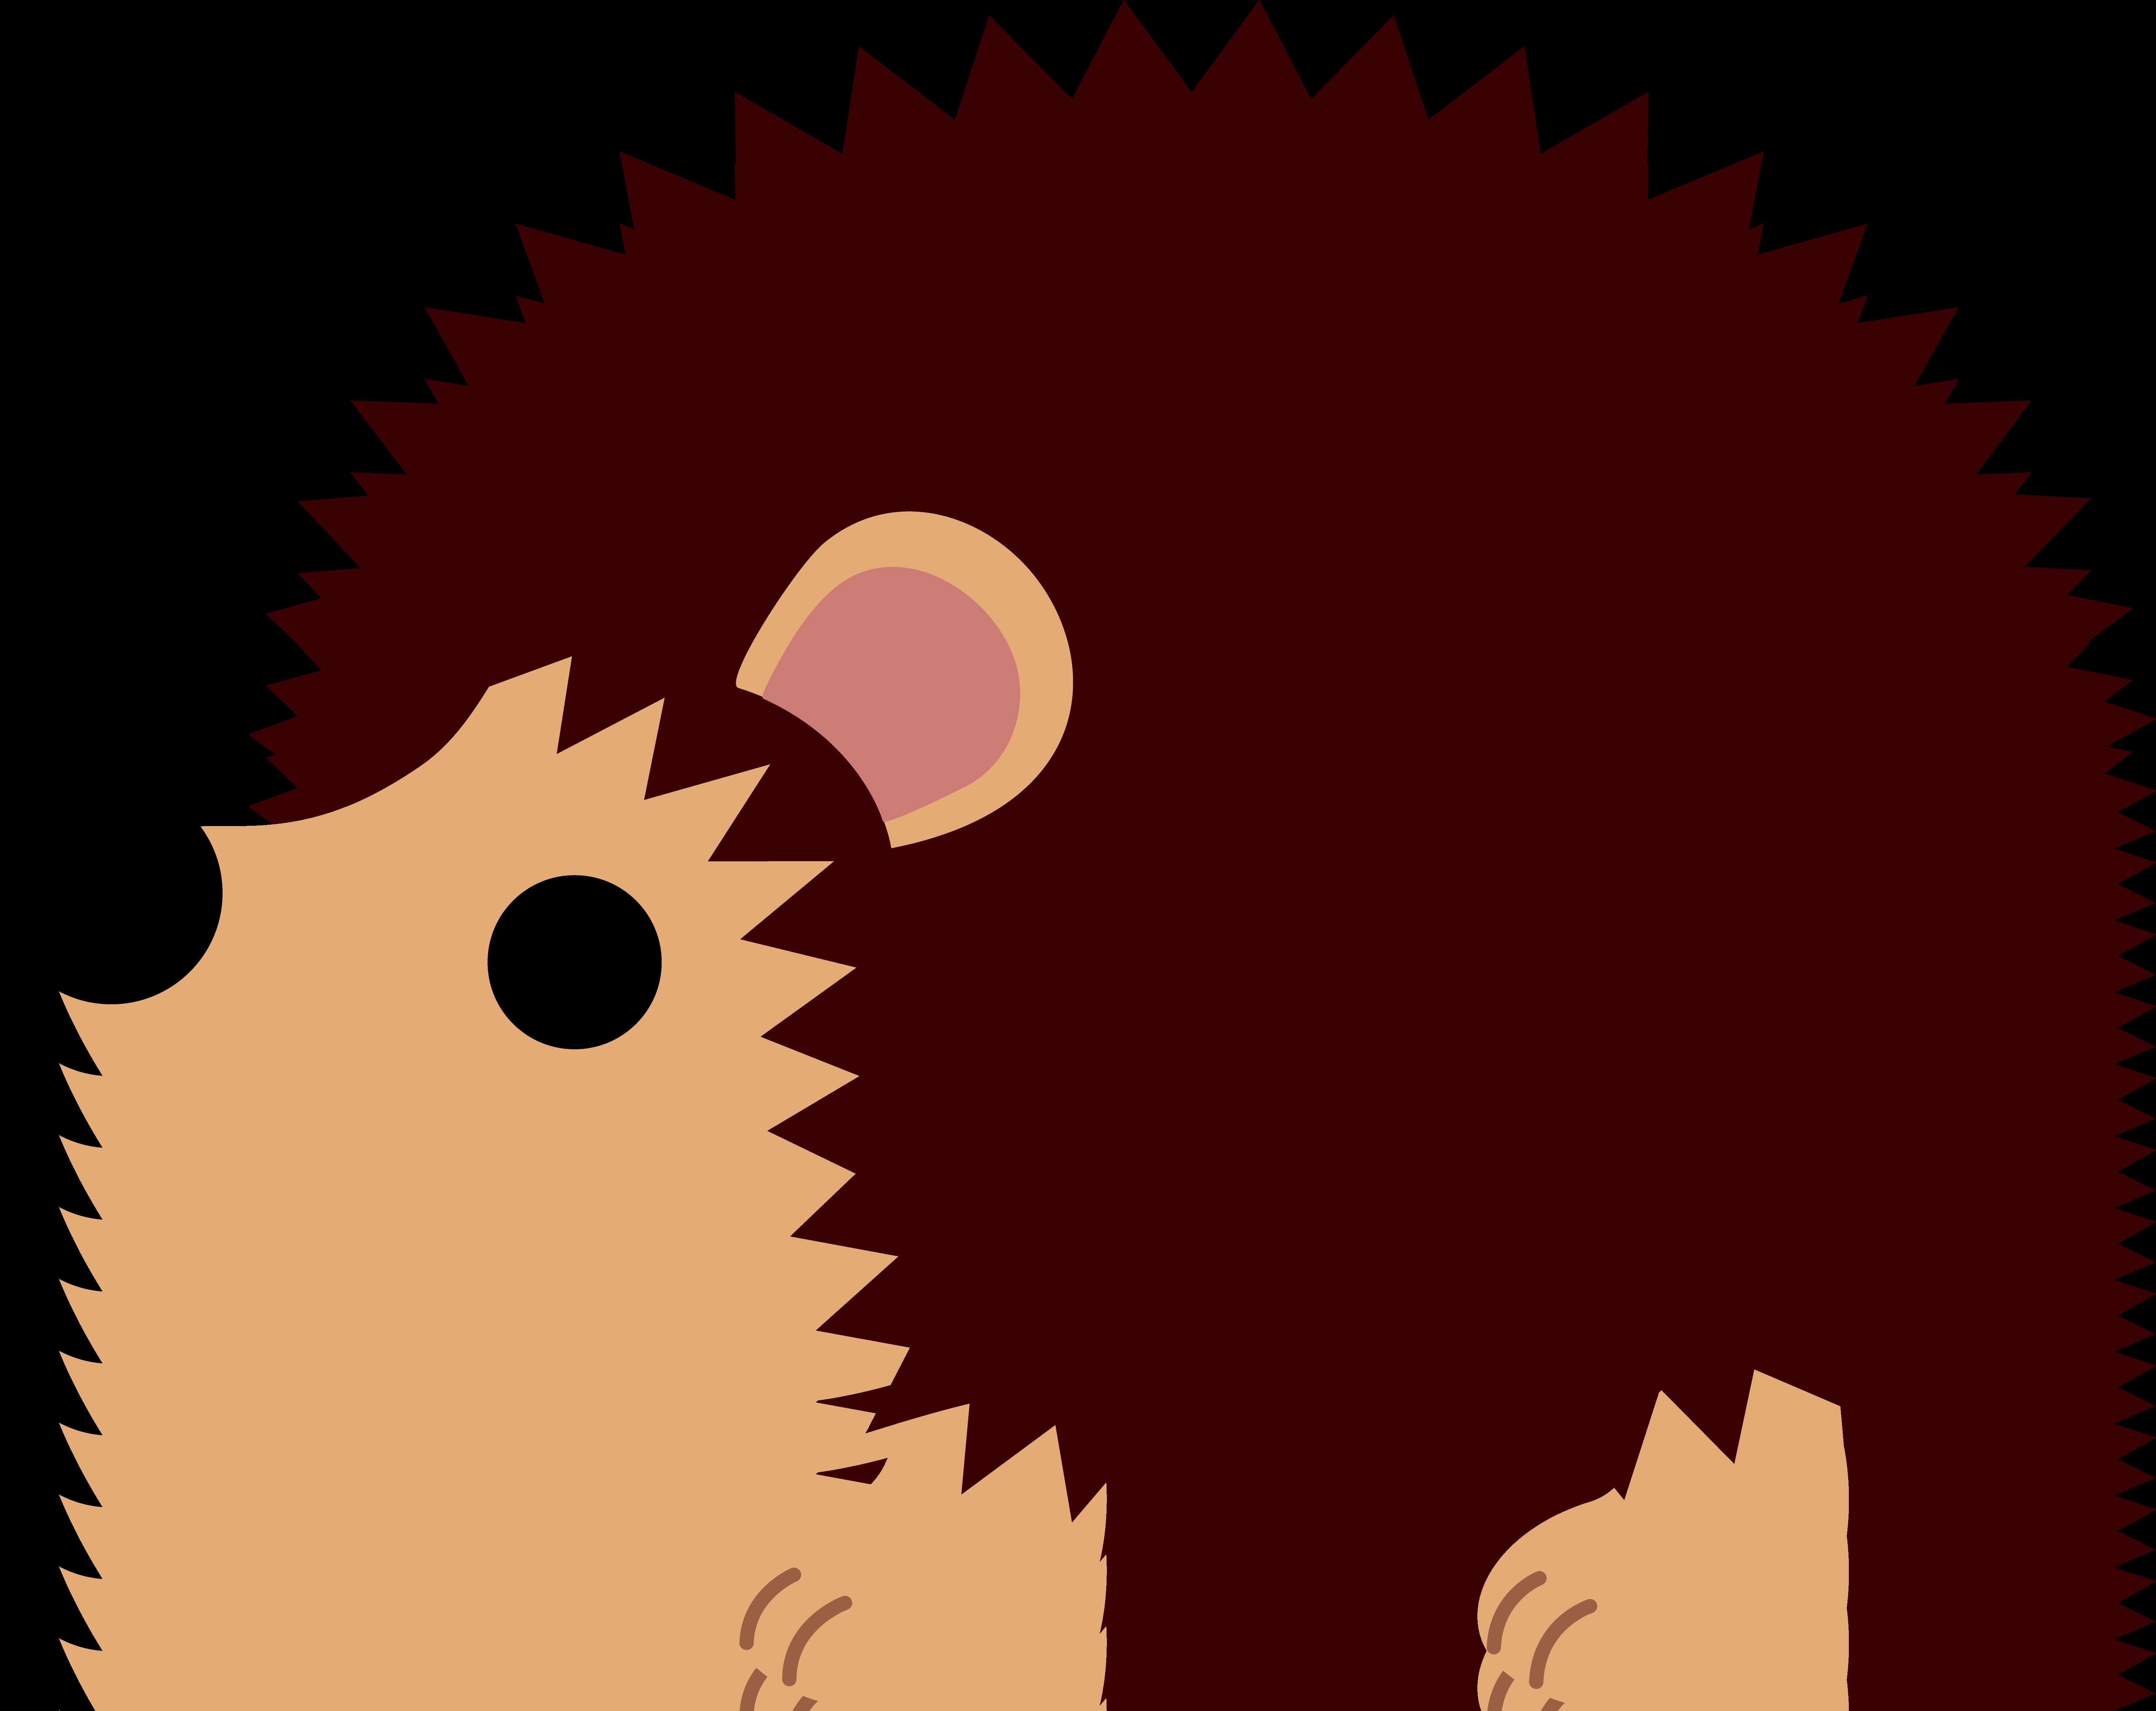 Cute Hedgehog Clipart Free Download Best Cute Hedgehog Clipart On